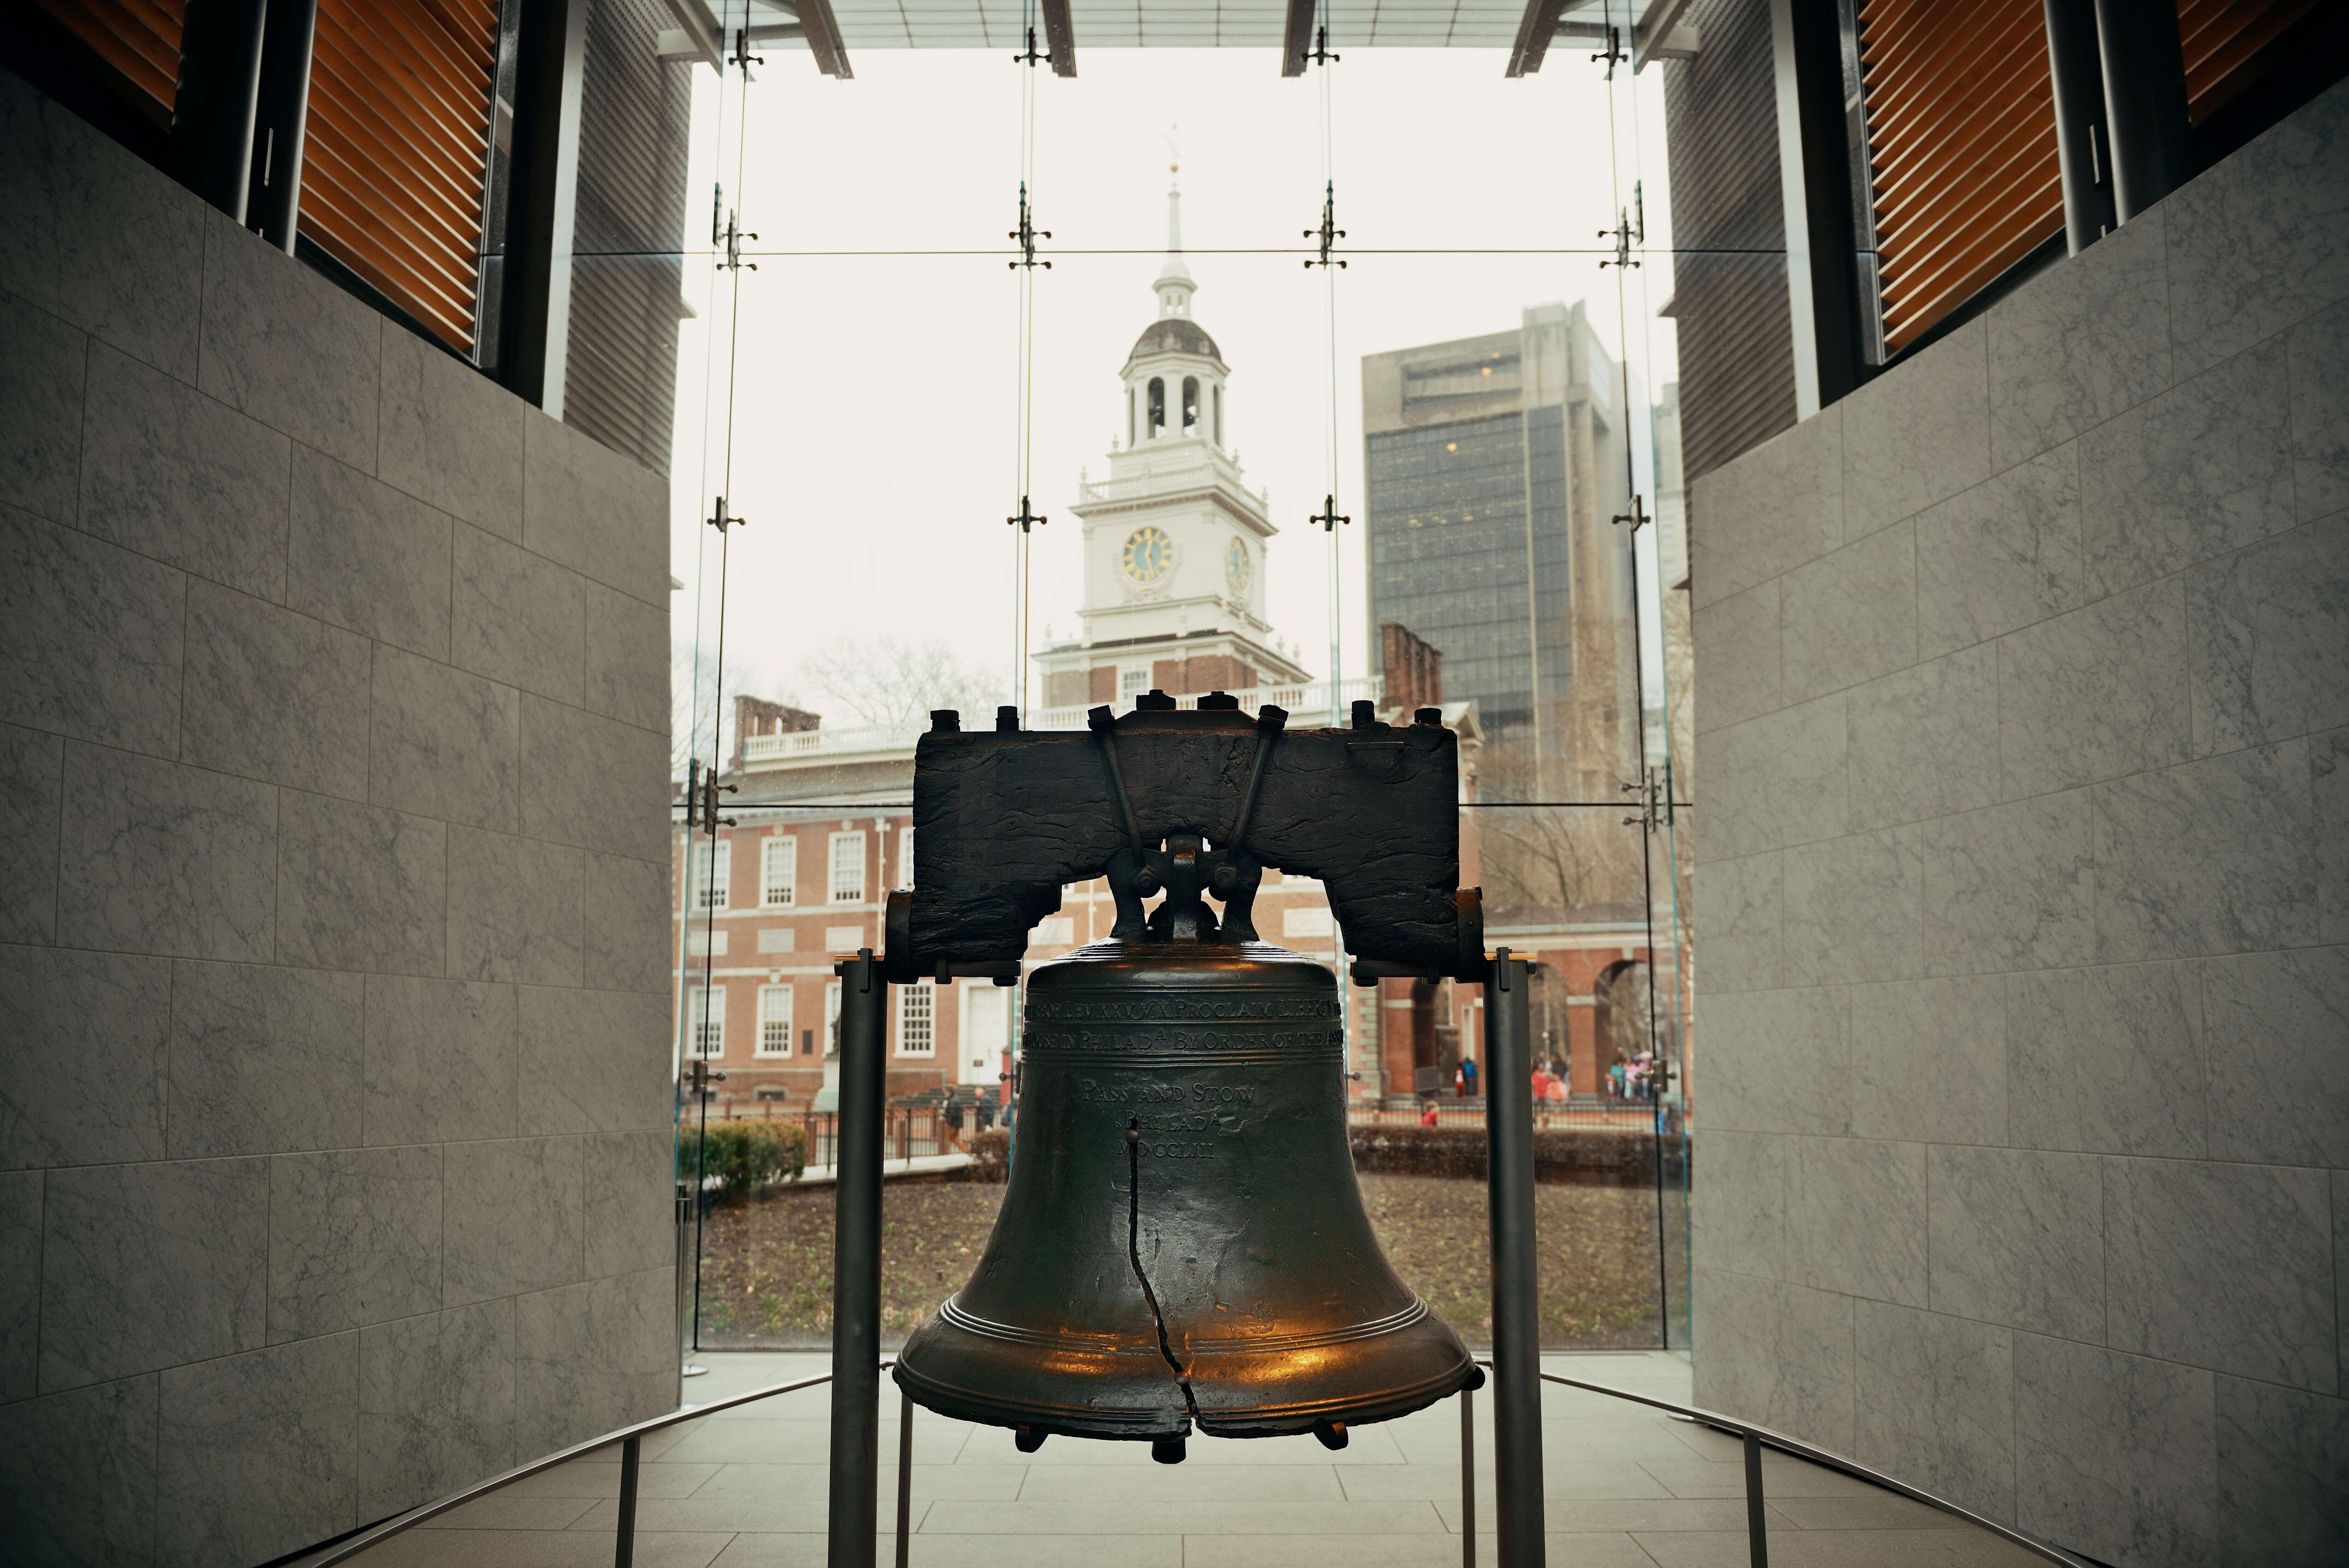 Heritage of America